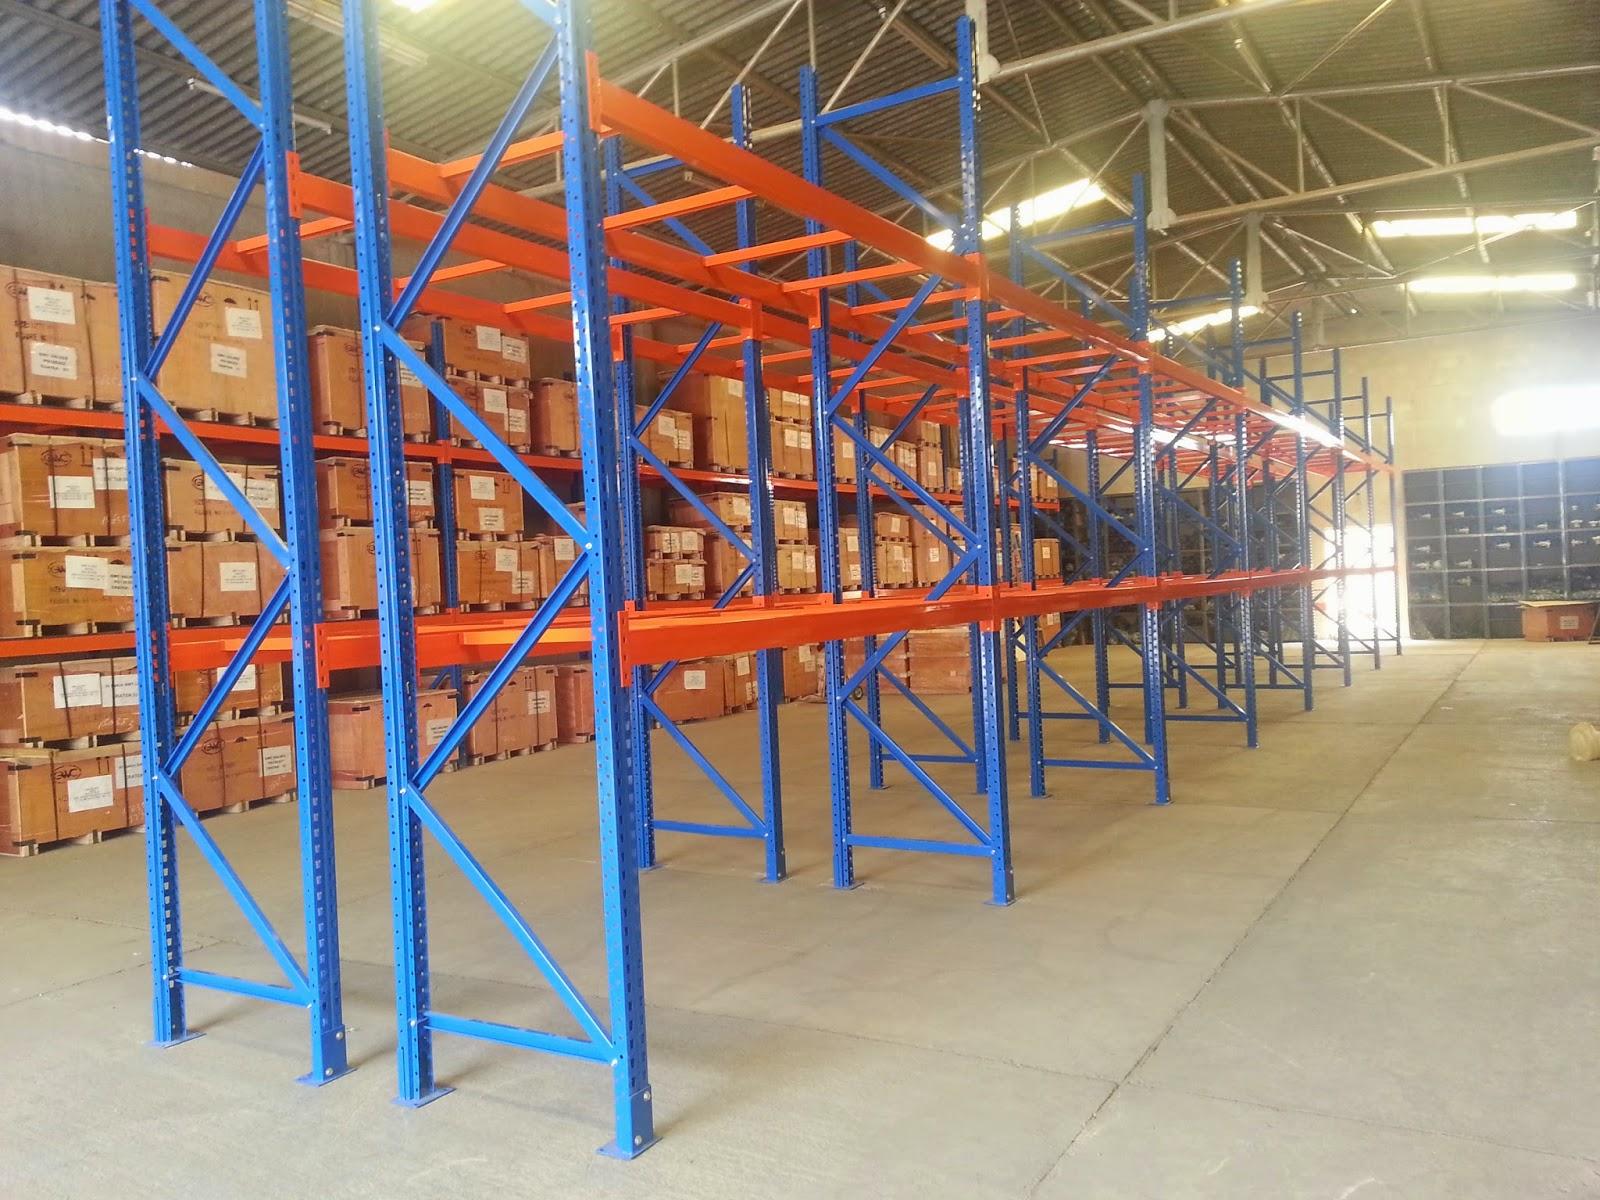 storage racking uae warehouse shelving in dubai. Black Bedroom Furniture Sets. Home Design Ideas